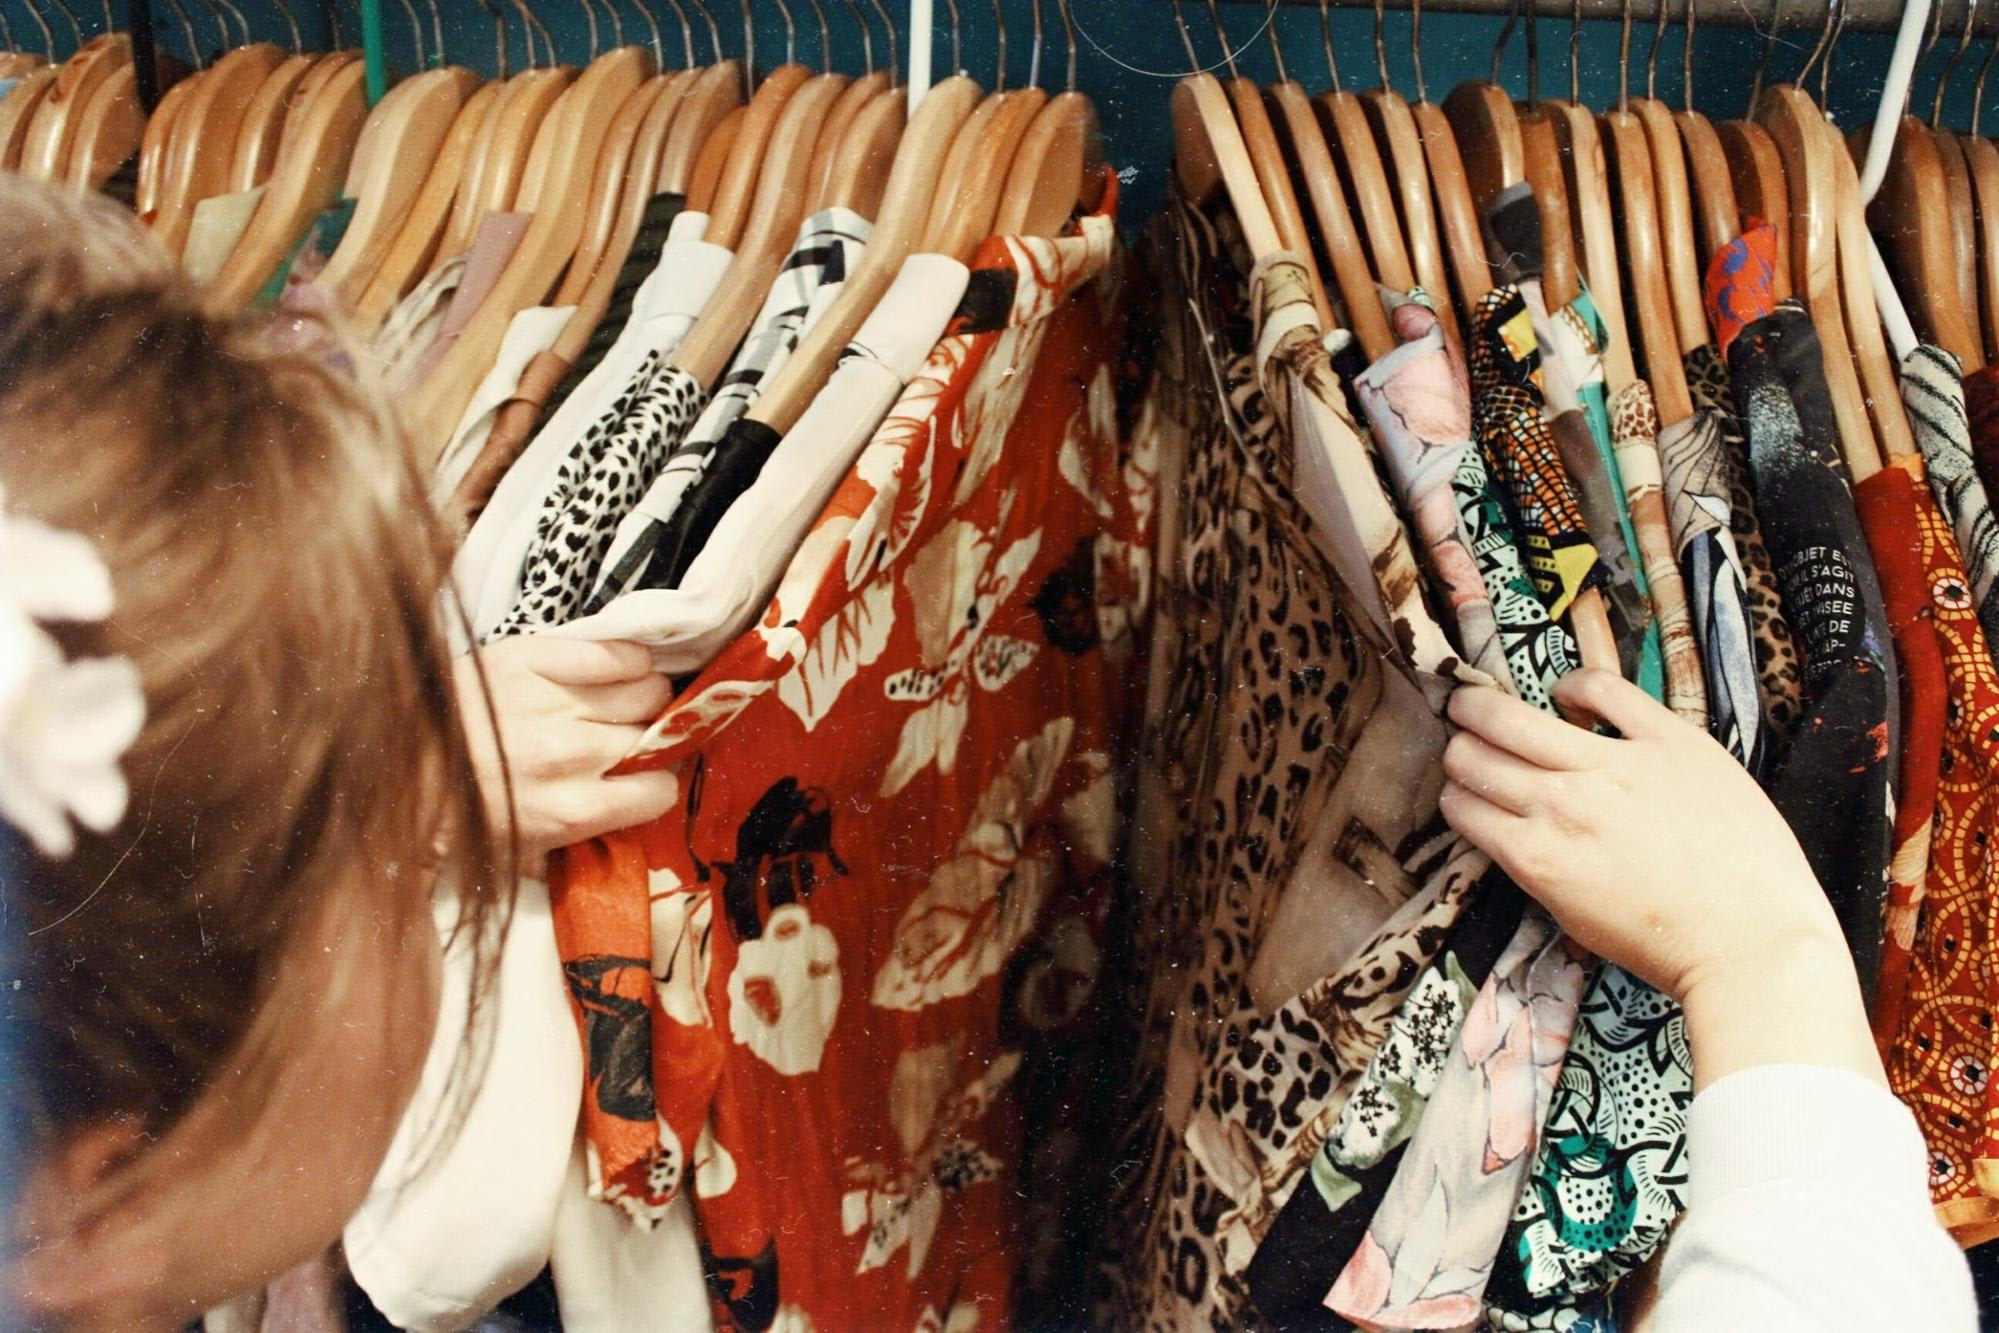 tung chung shopping